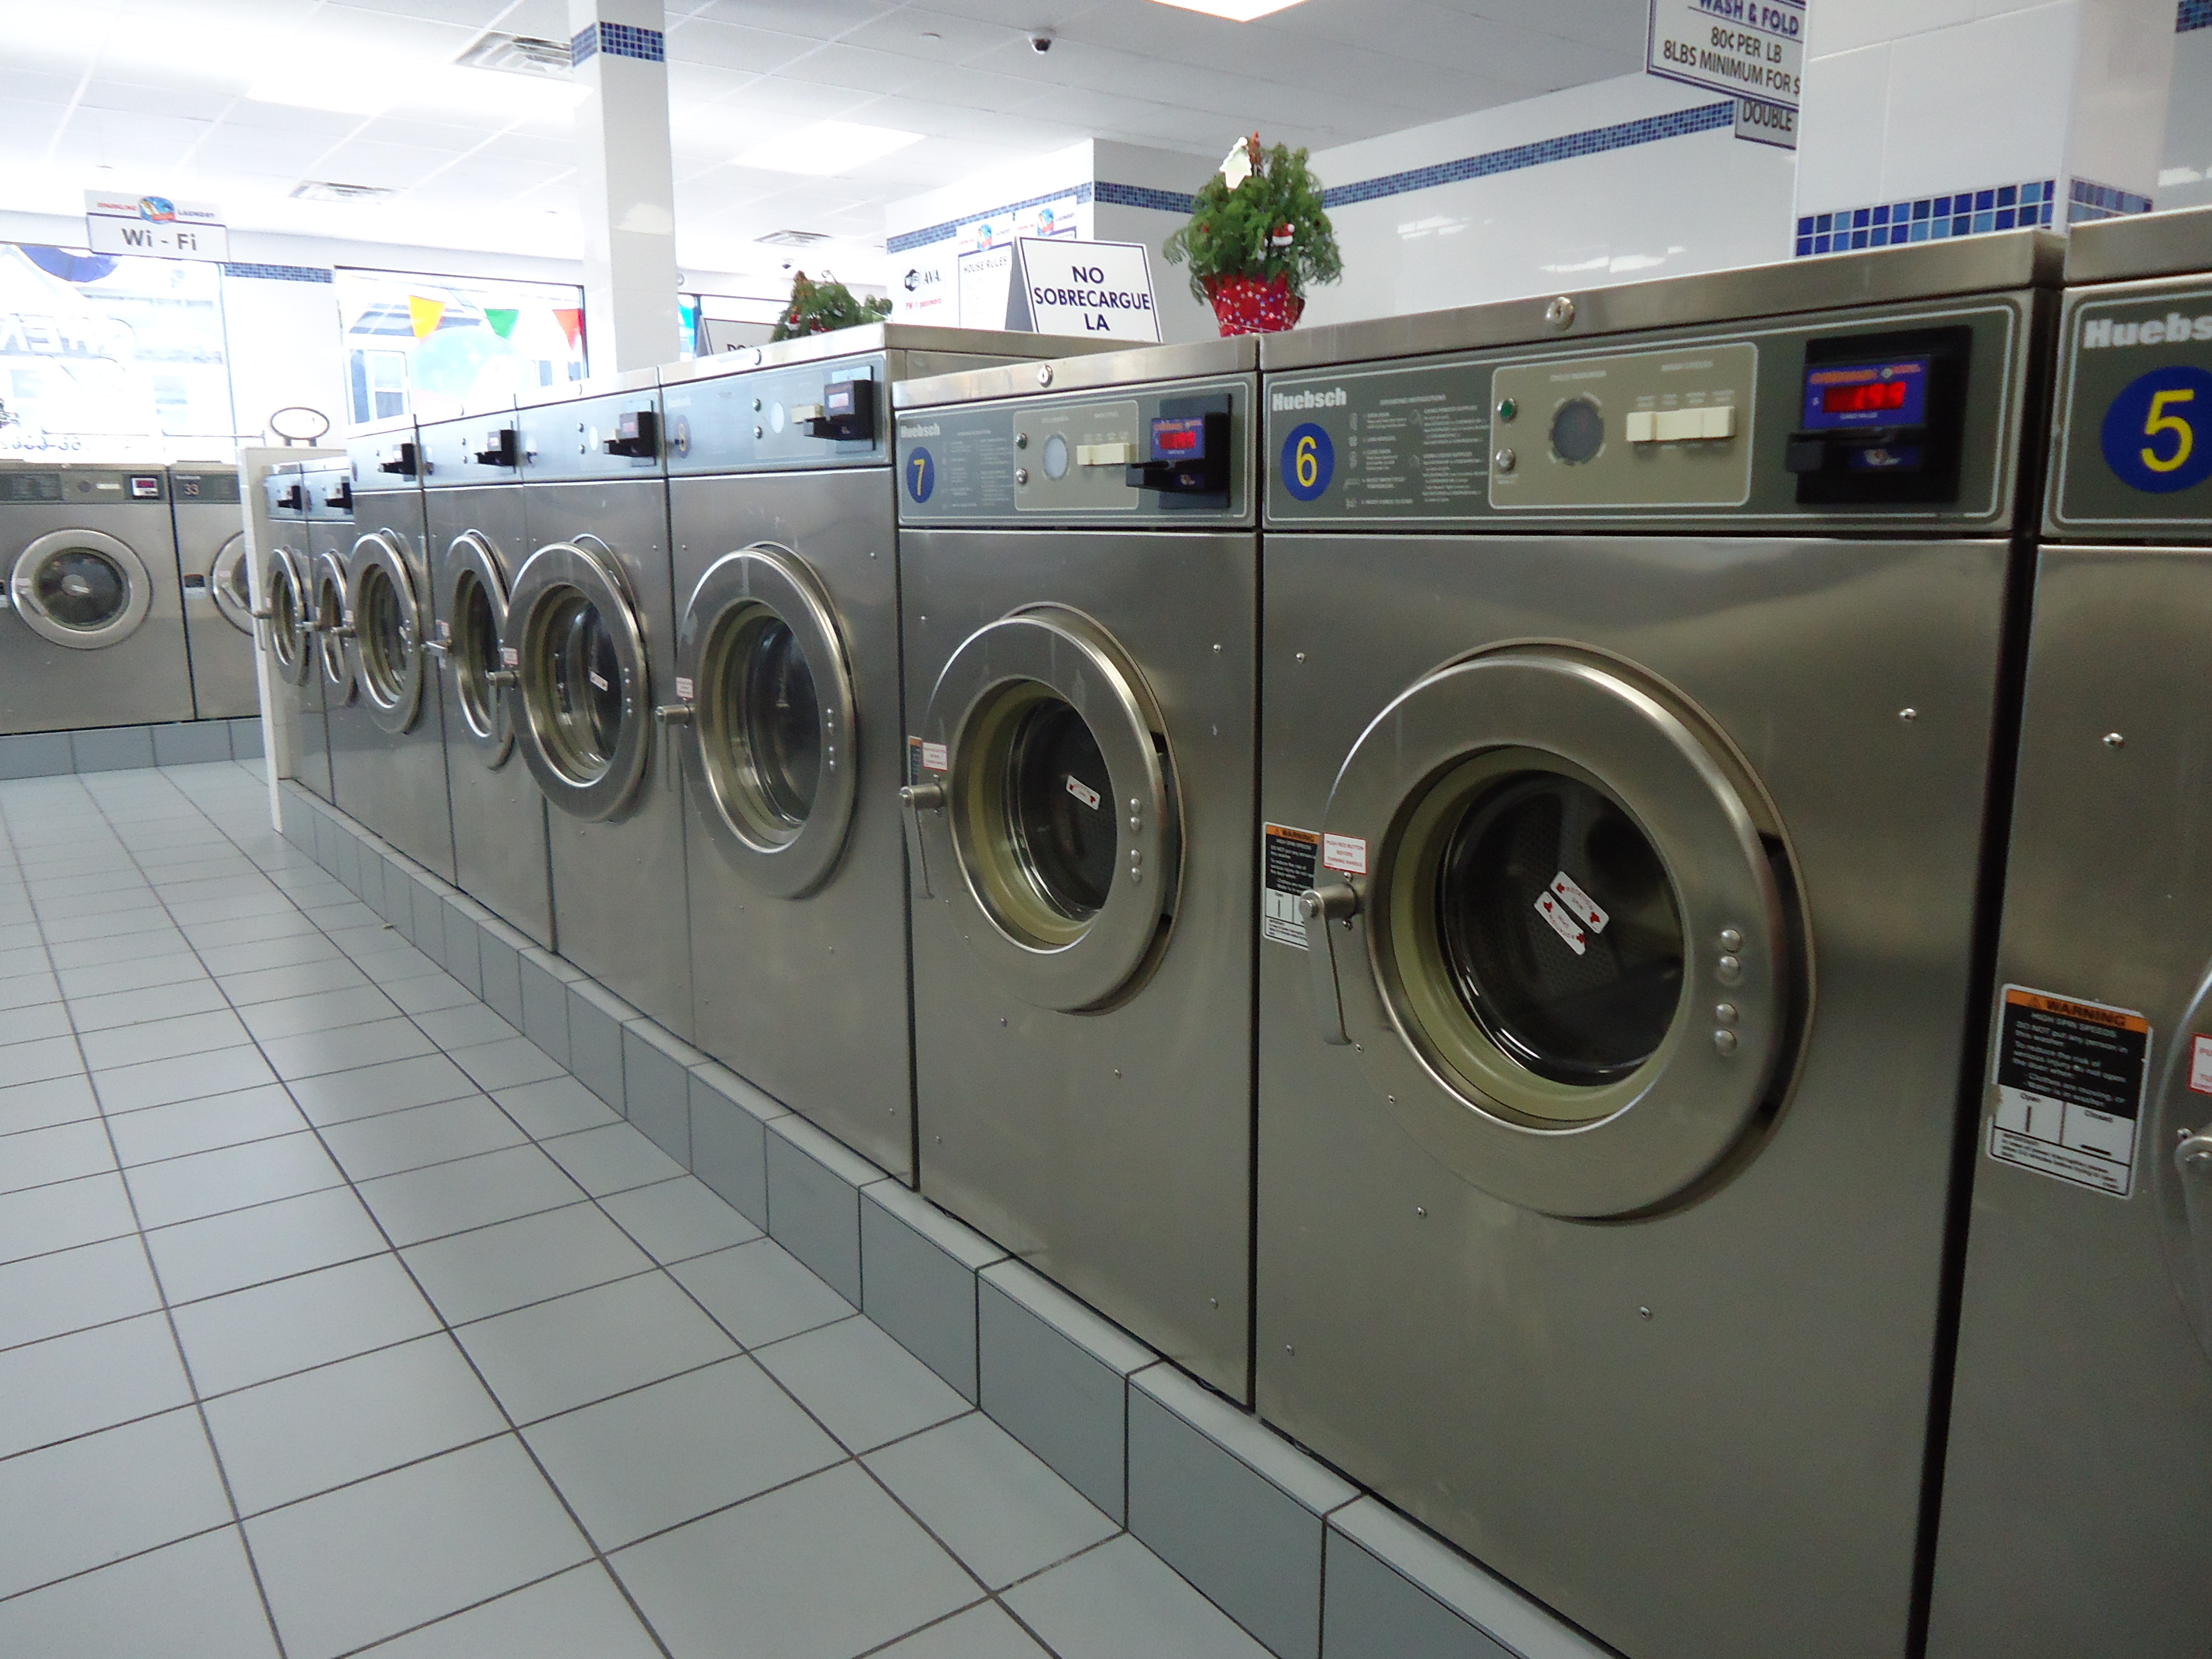 Laundromat + Builing (런드리멧 + 건물) – Bronx